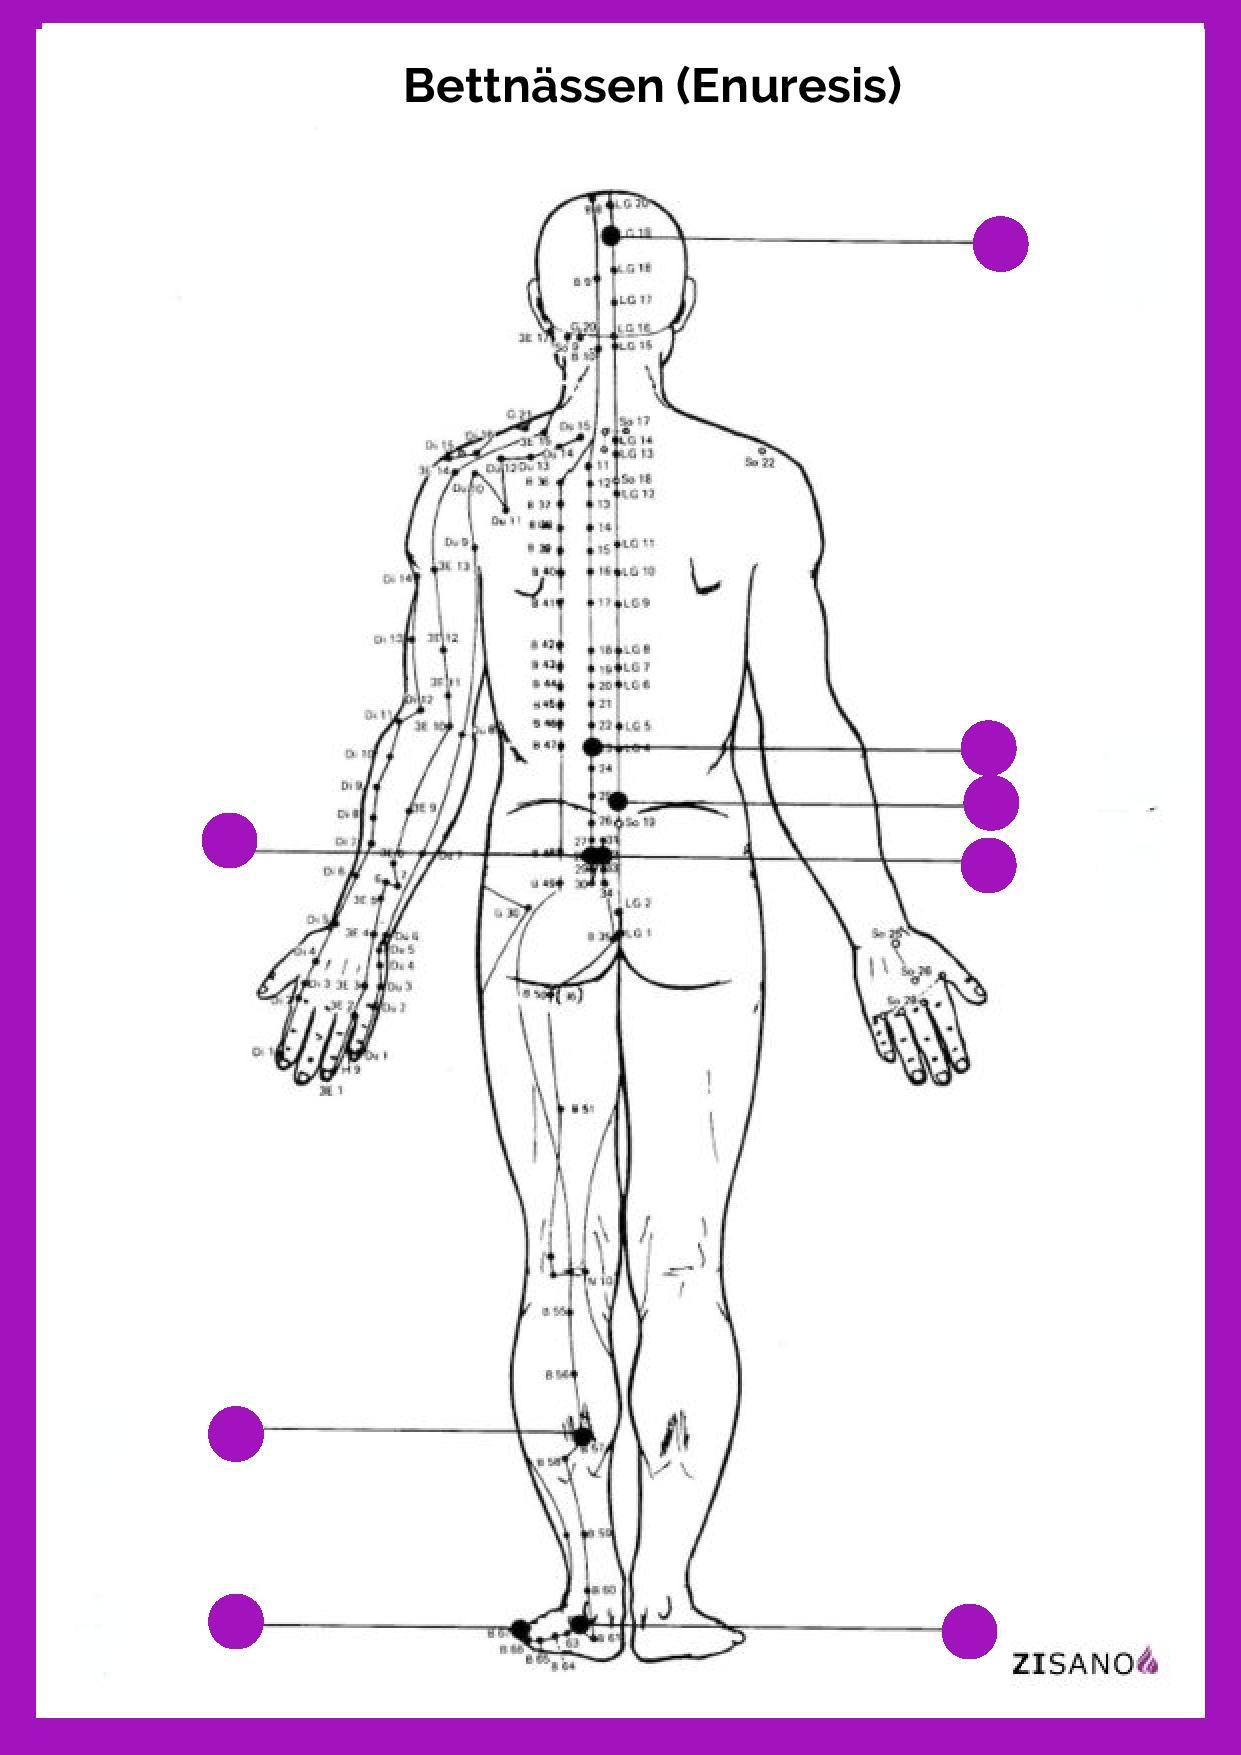 Meridiane - Bettnässen (Enuresis)- Behandlung